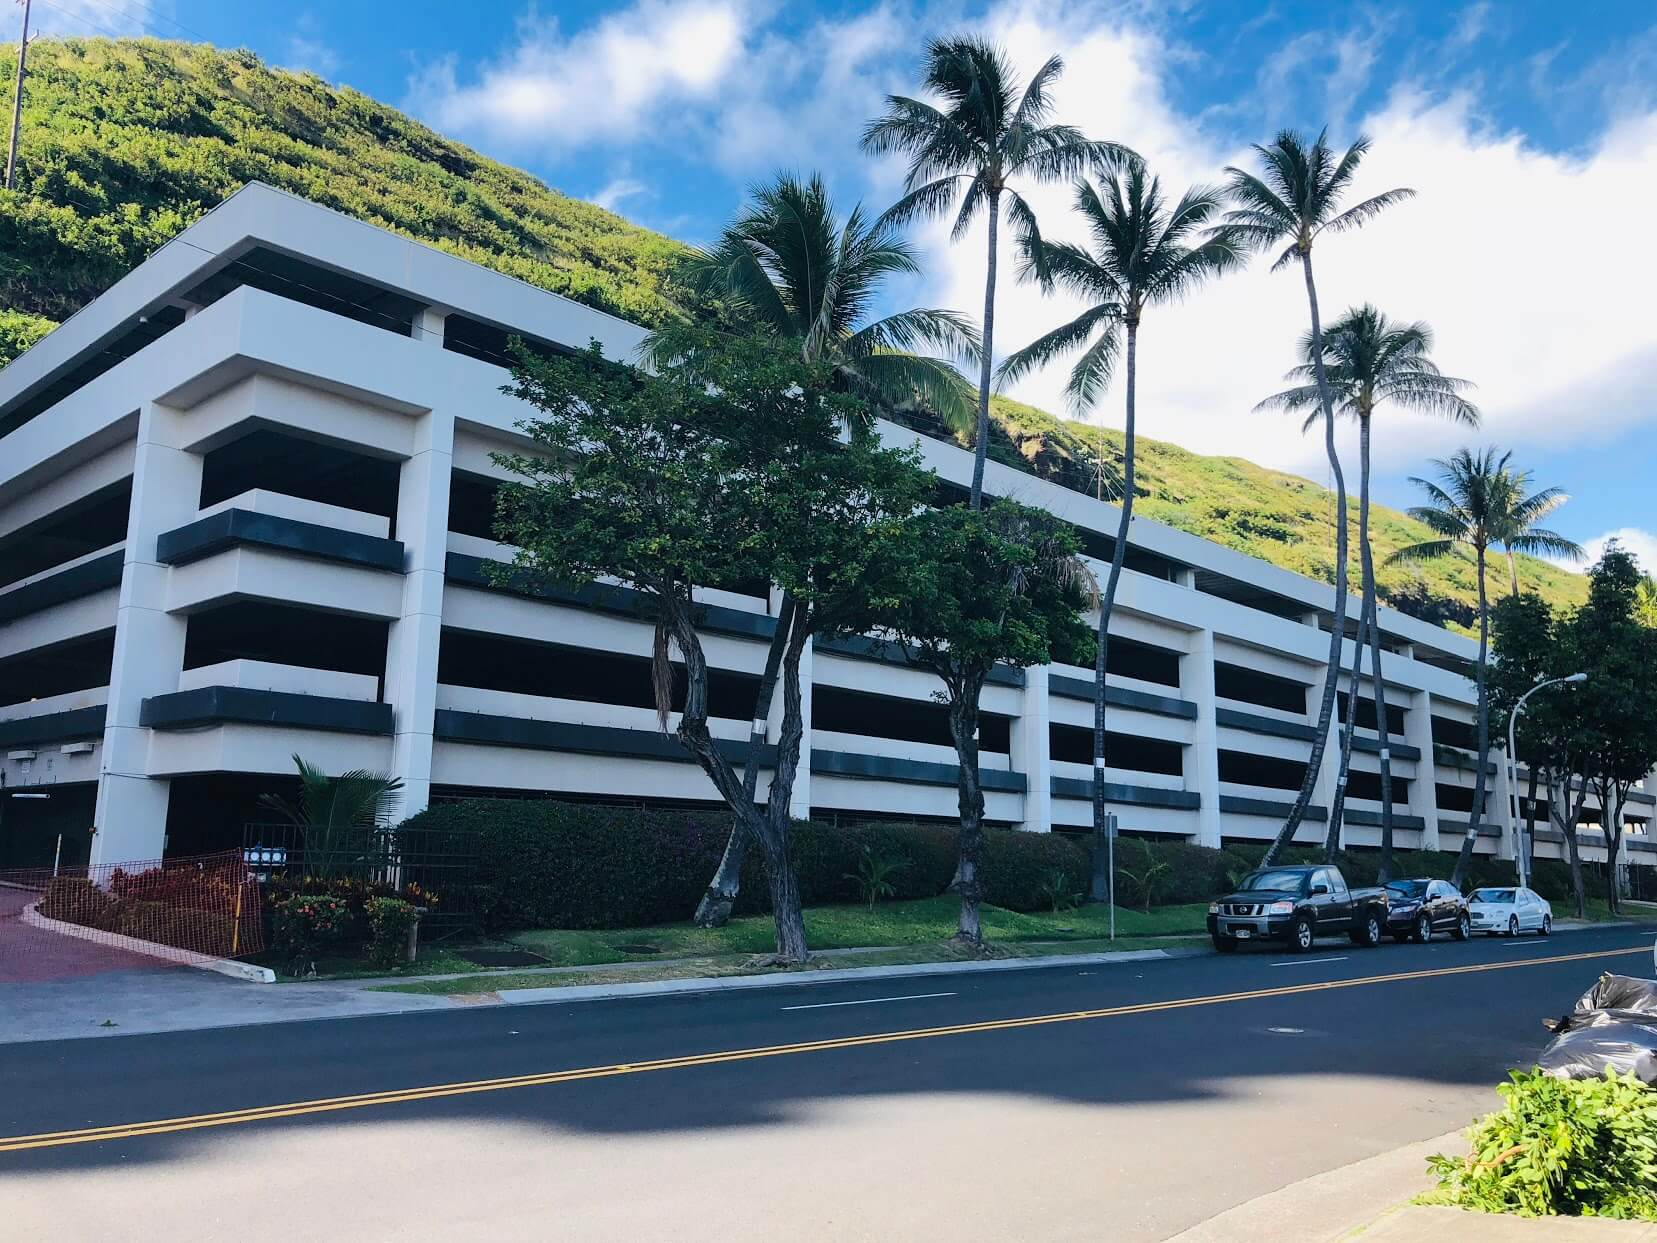 Mount Terraceの駐車場